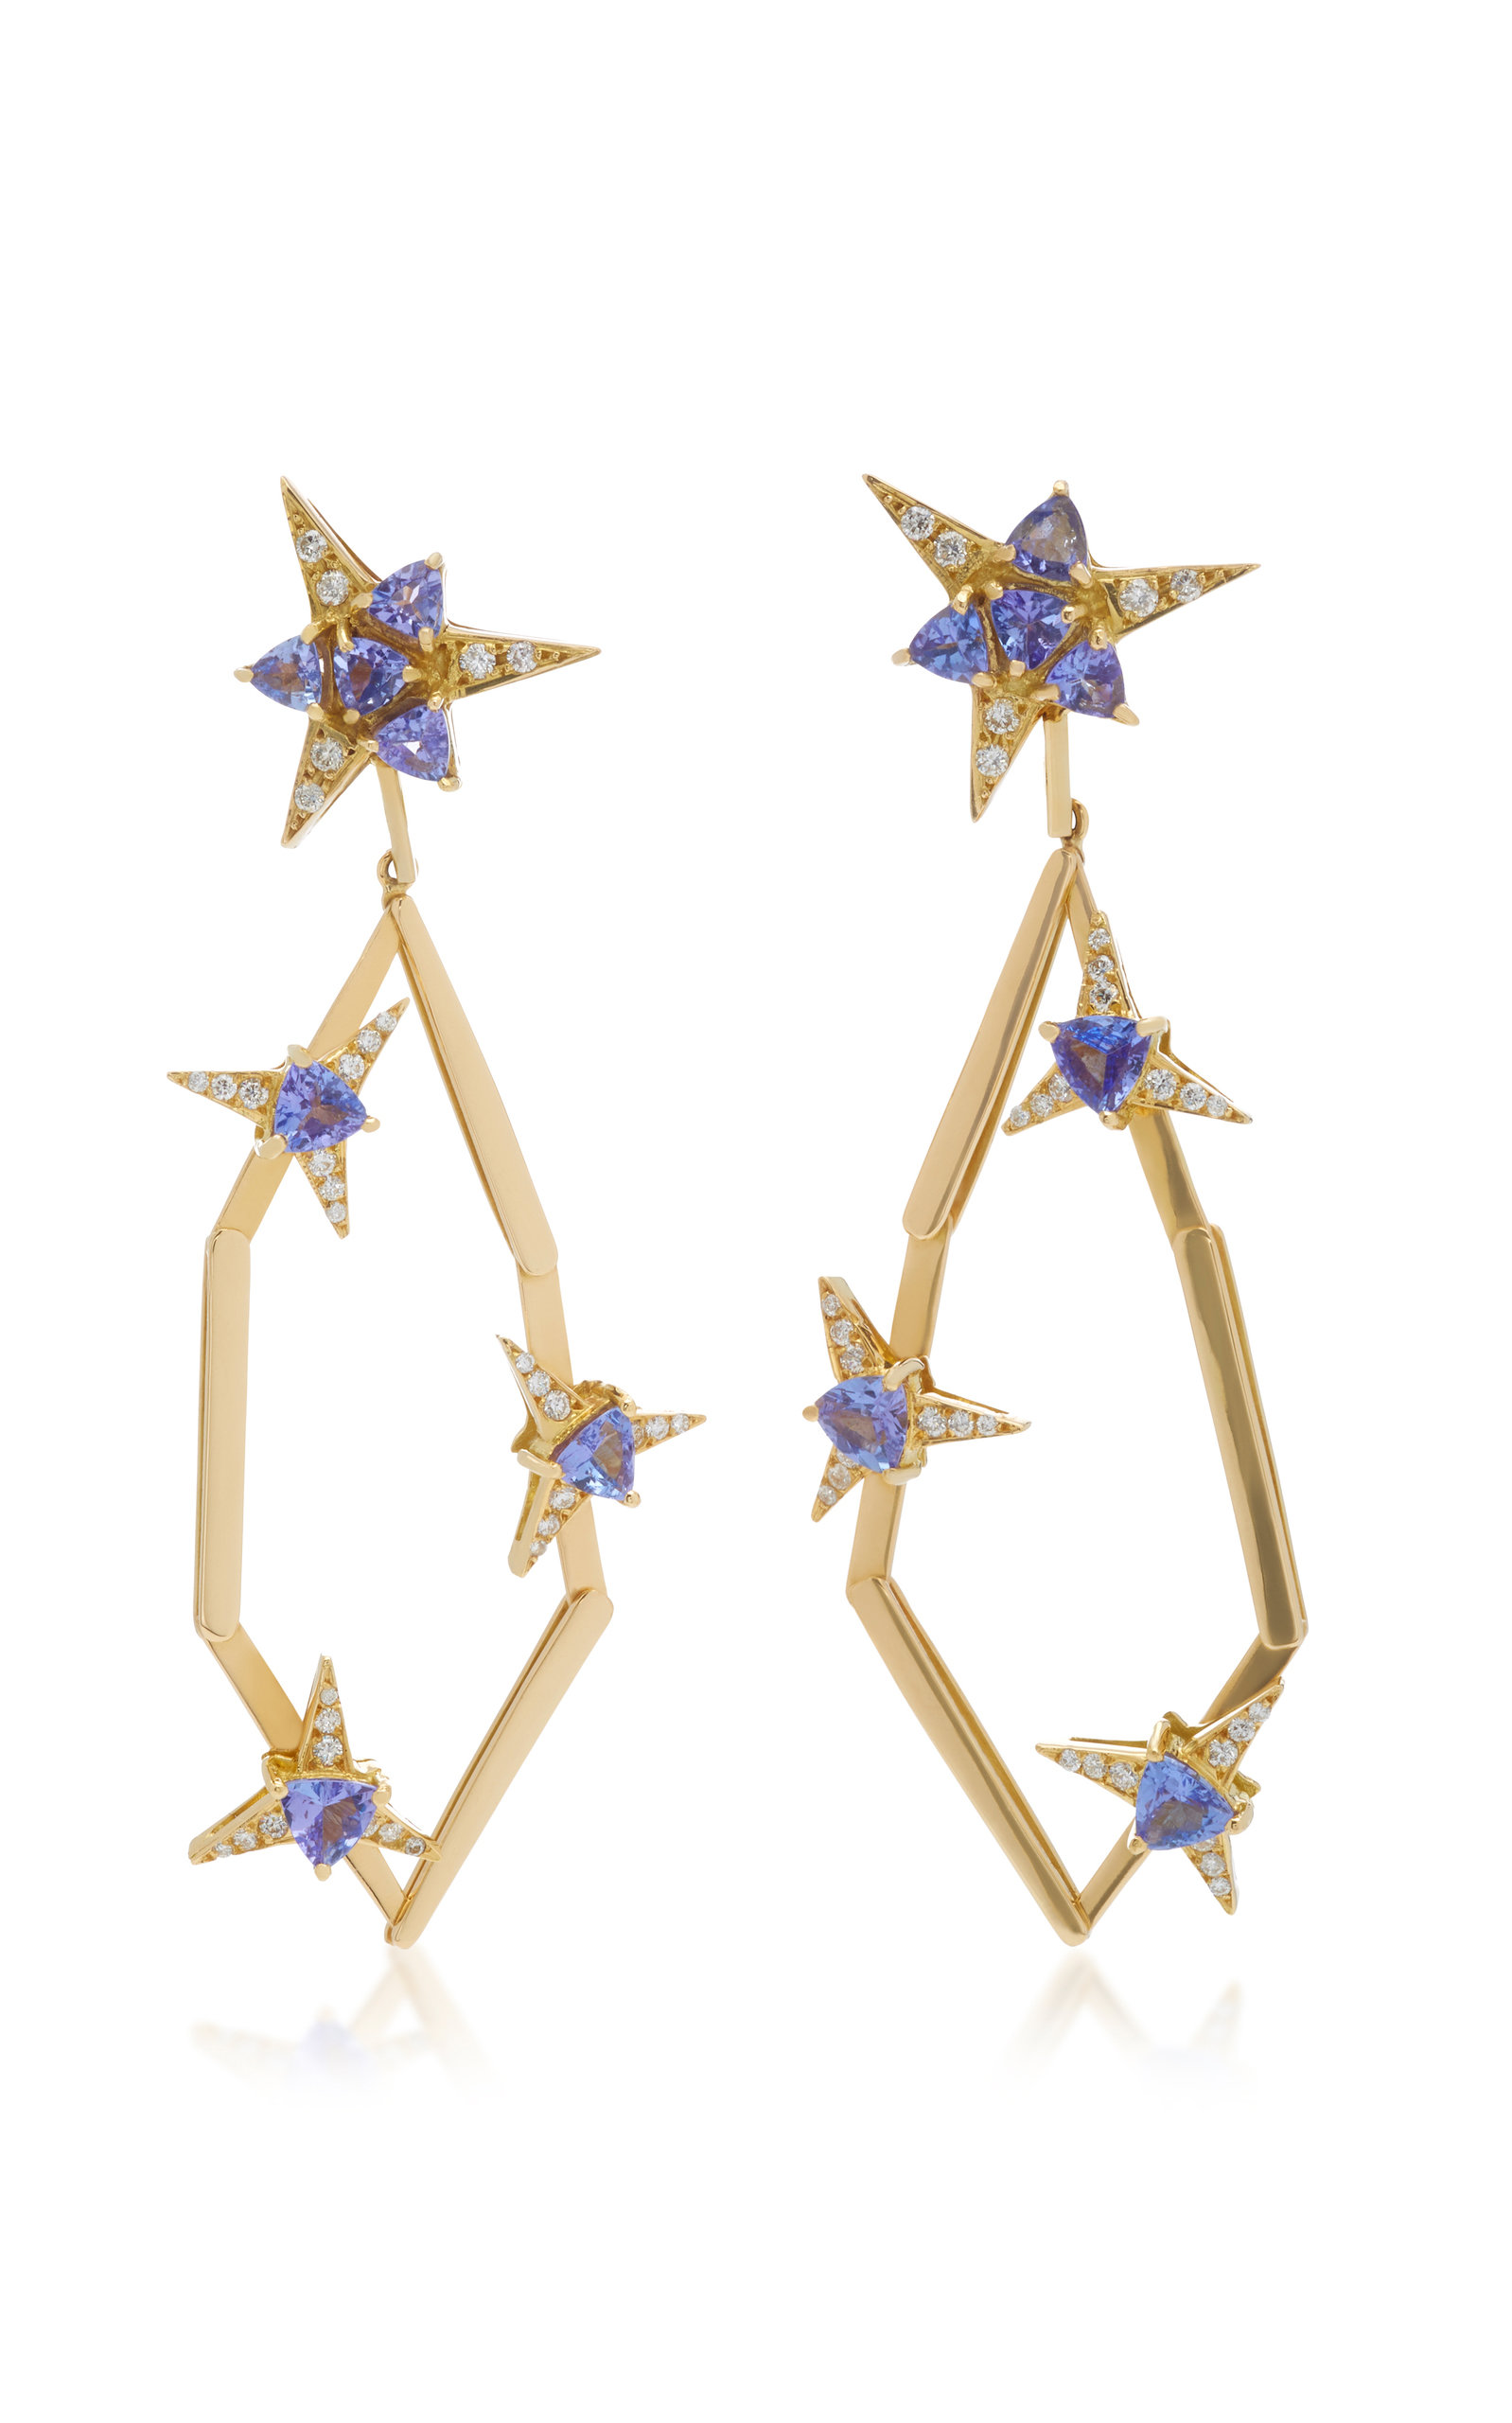 CAROL KAUFFMANN Galactic Star 18K Gold Tanzanite And Diamond Drop Earrings in Blue